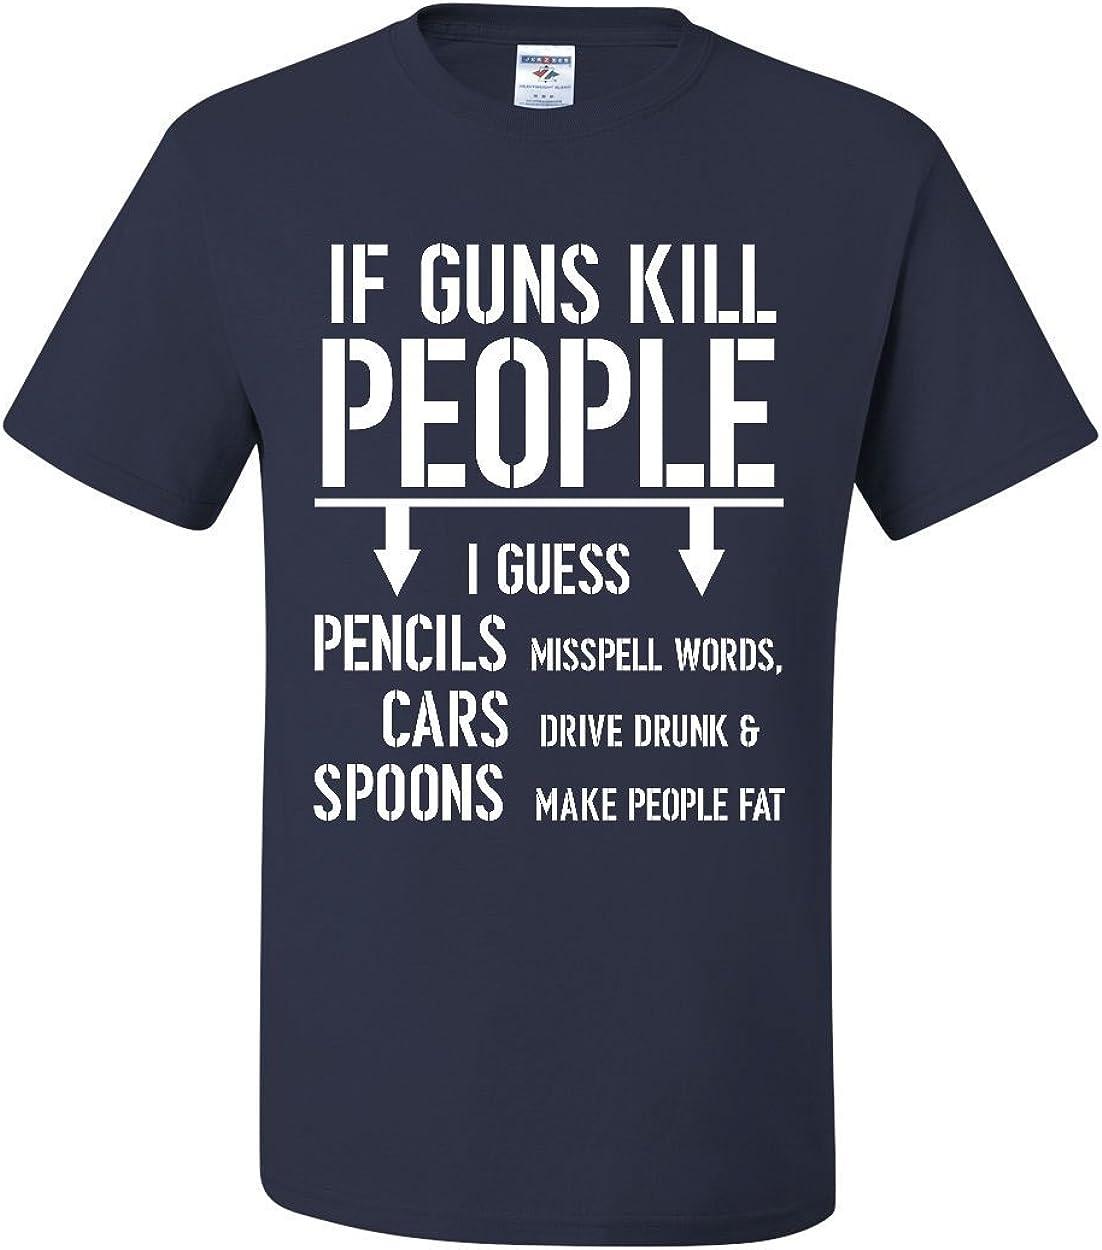 If Guns Kill People T-Shirt 2nd Gun Rights 2A 5 ☆ popular Funny Me Amendment Max 60% OFF